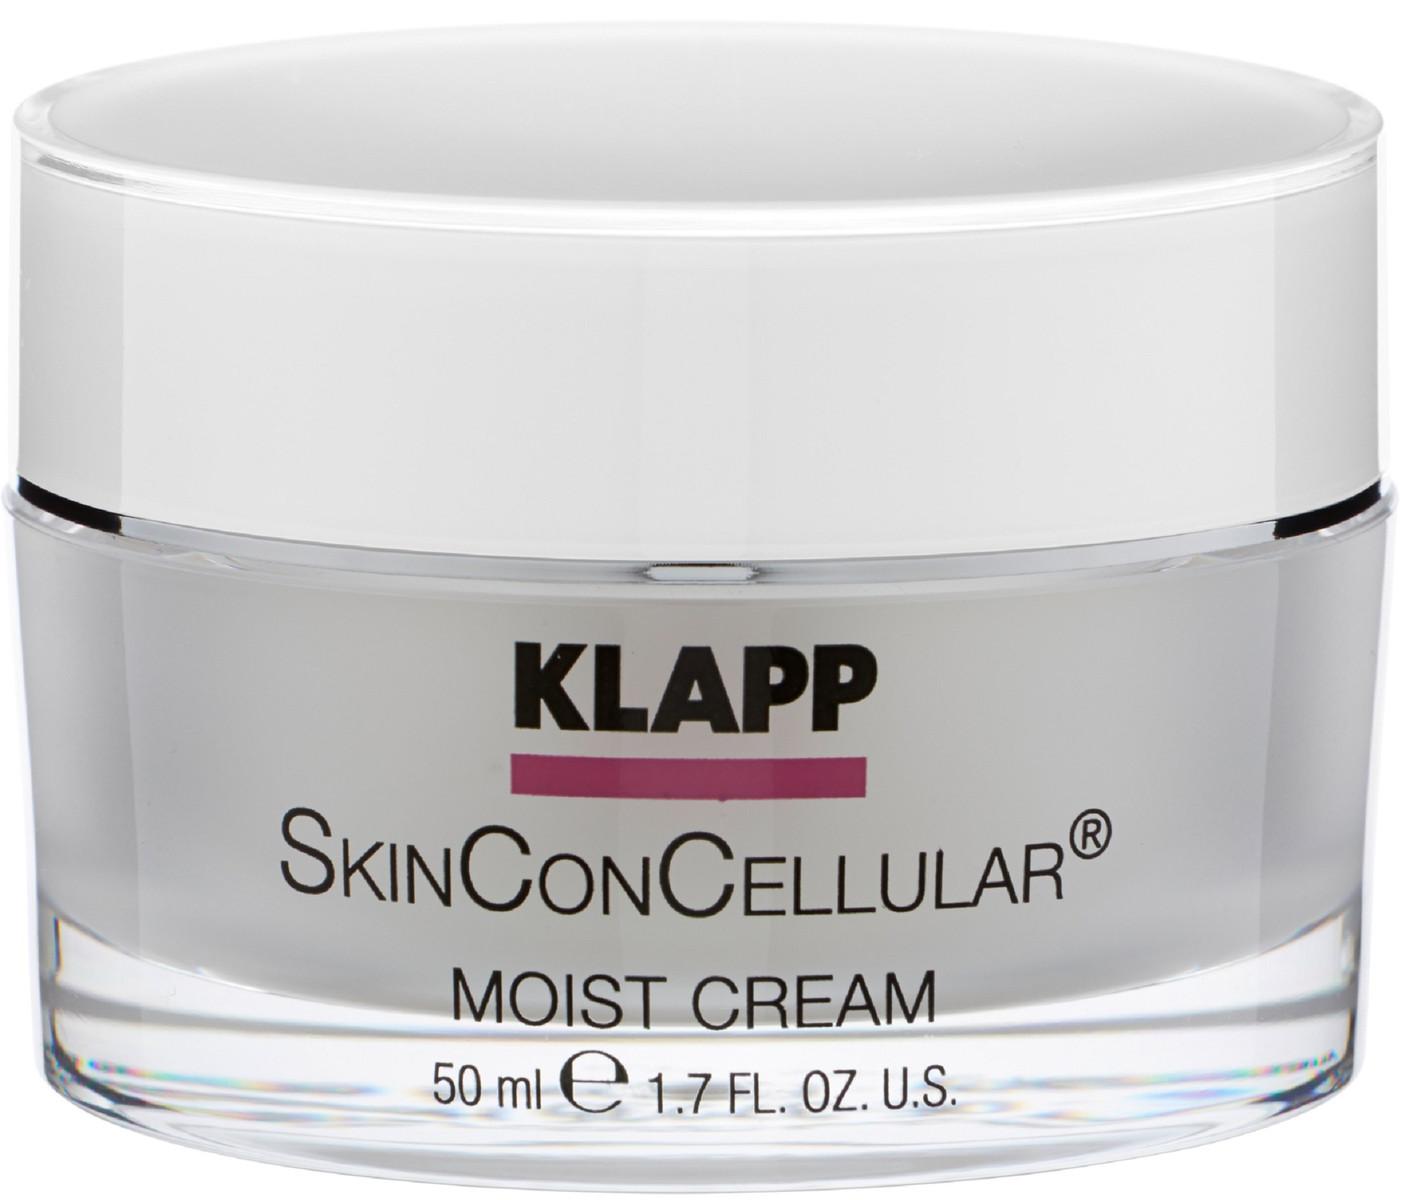 Увлажняющий крем Klapp SkinConCellular Moist Cream, 50 ml.